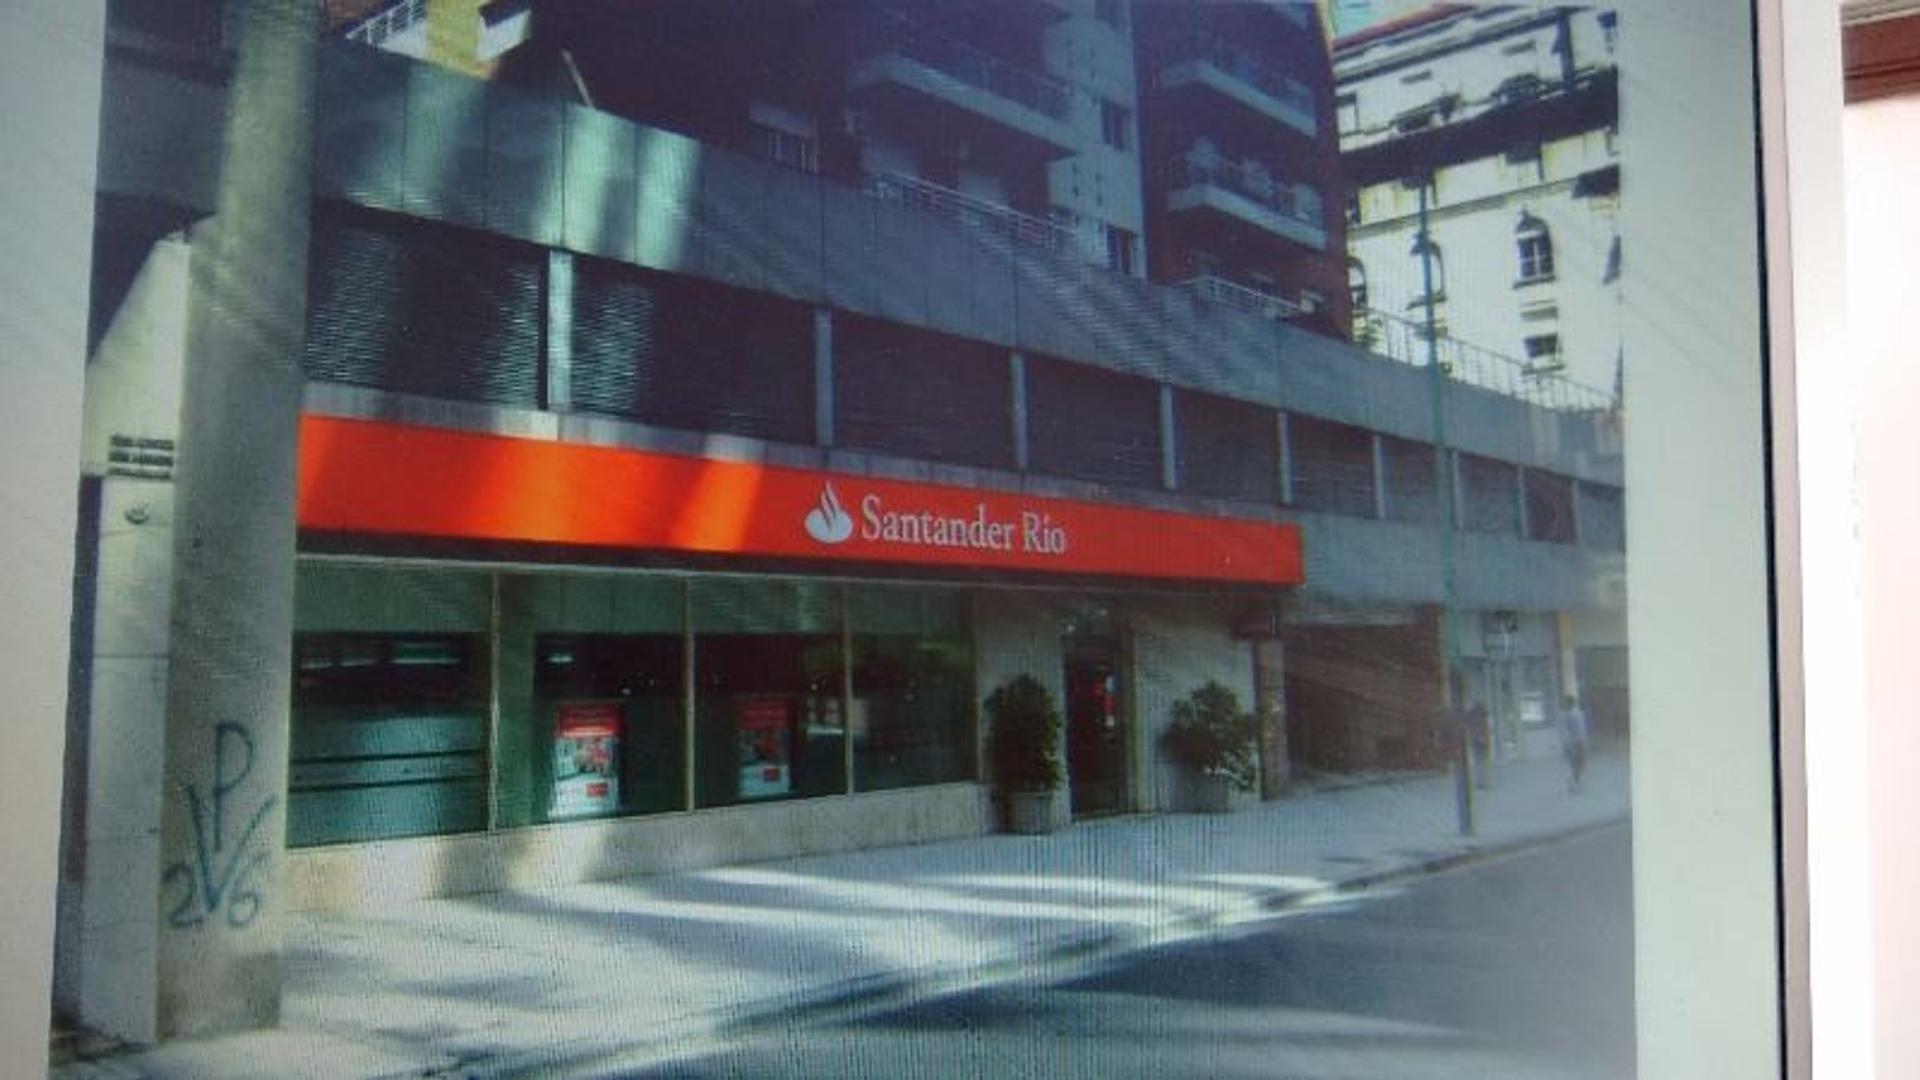 IMPORTANTE LOCAL - EX SUCURSAL BANCARIA - FRENTE 19,5 mts - FRENTE A HOTEL INTER-CONTINENTAL!!